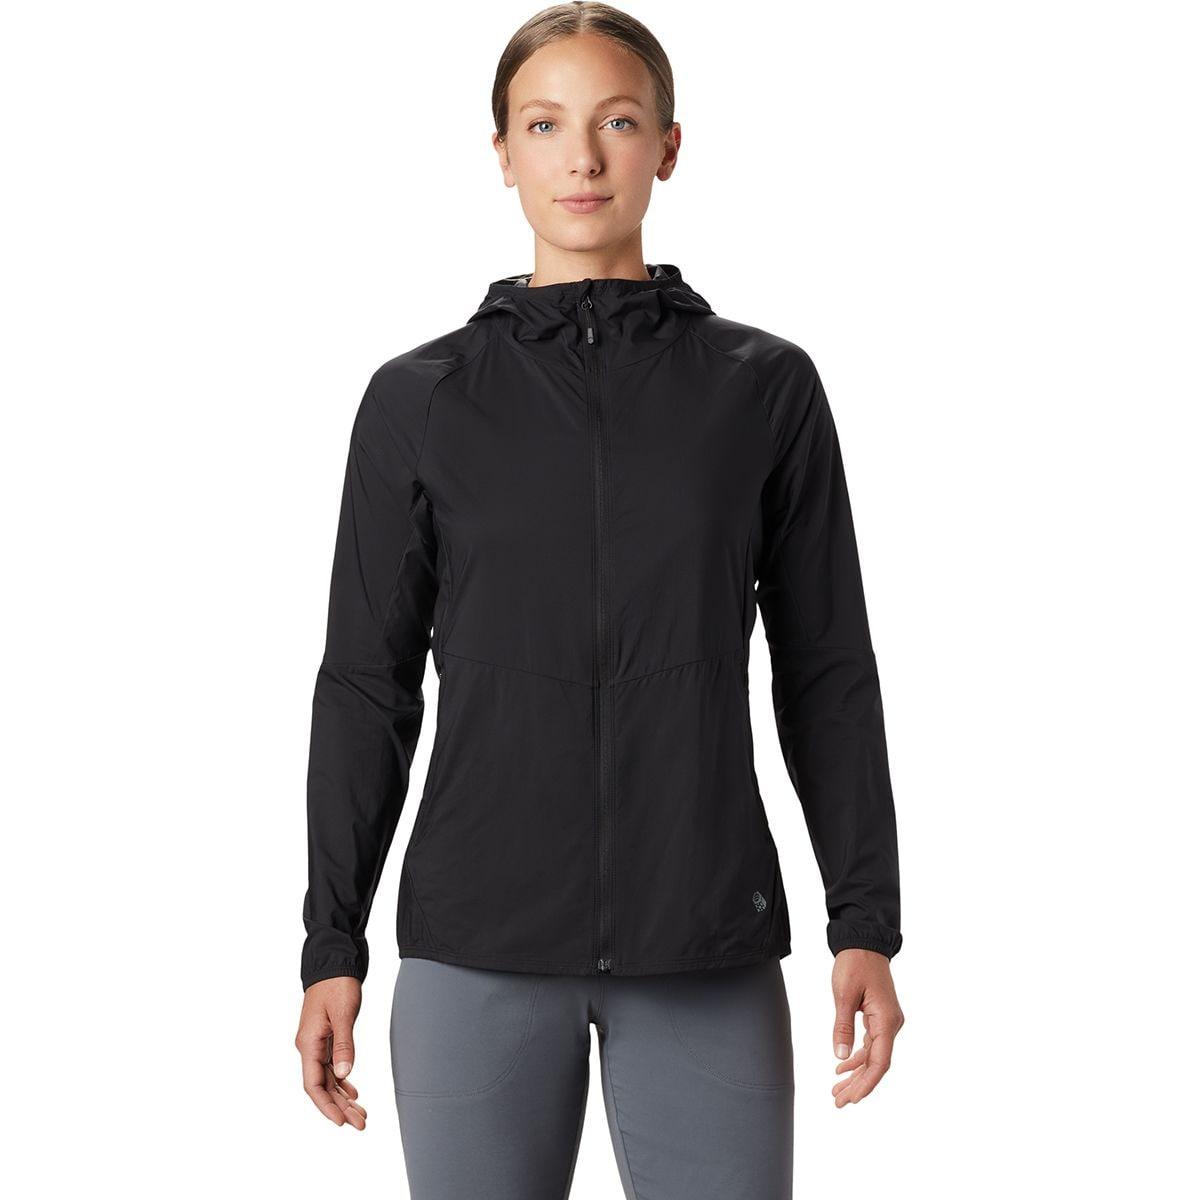 Kor Preshell Hooded Jacket - Women